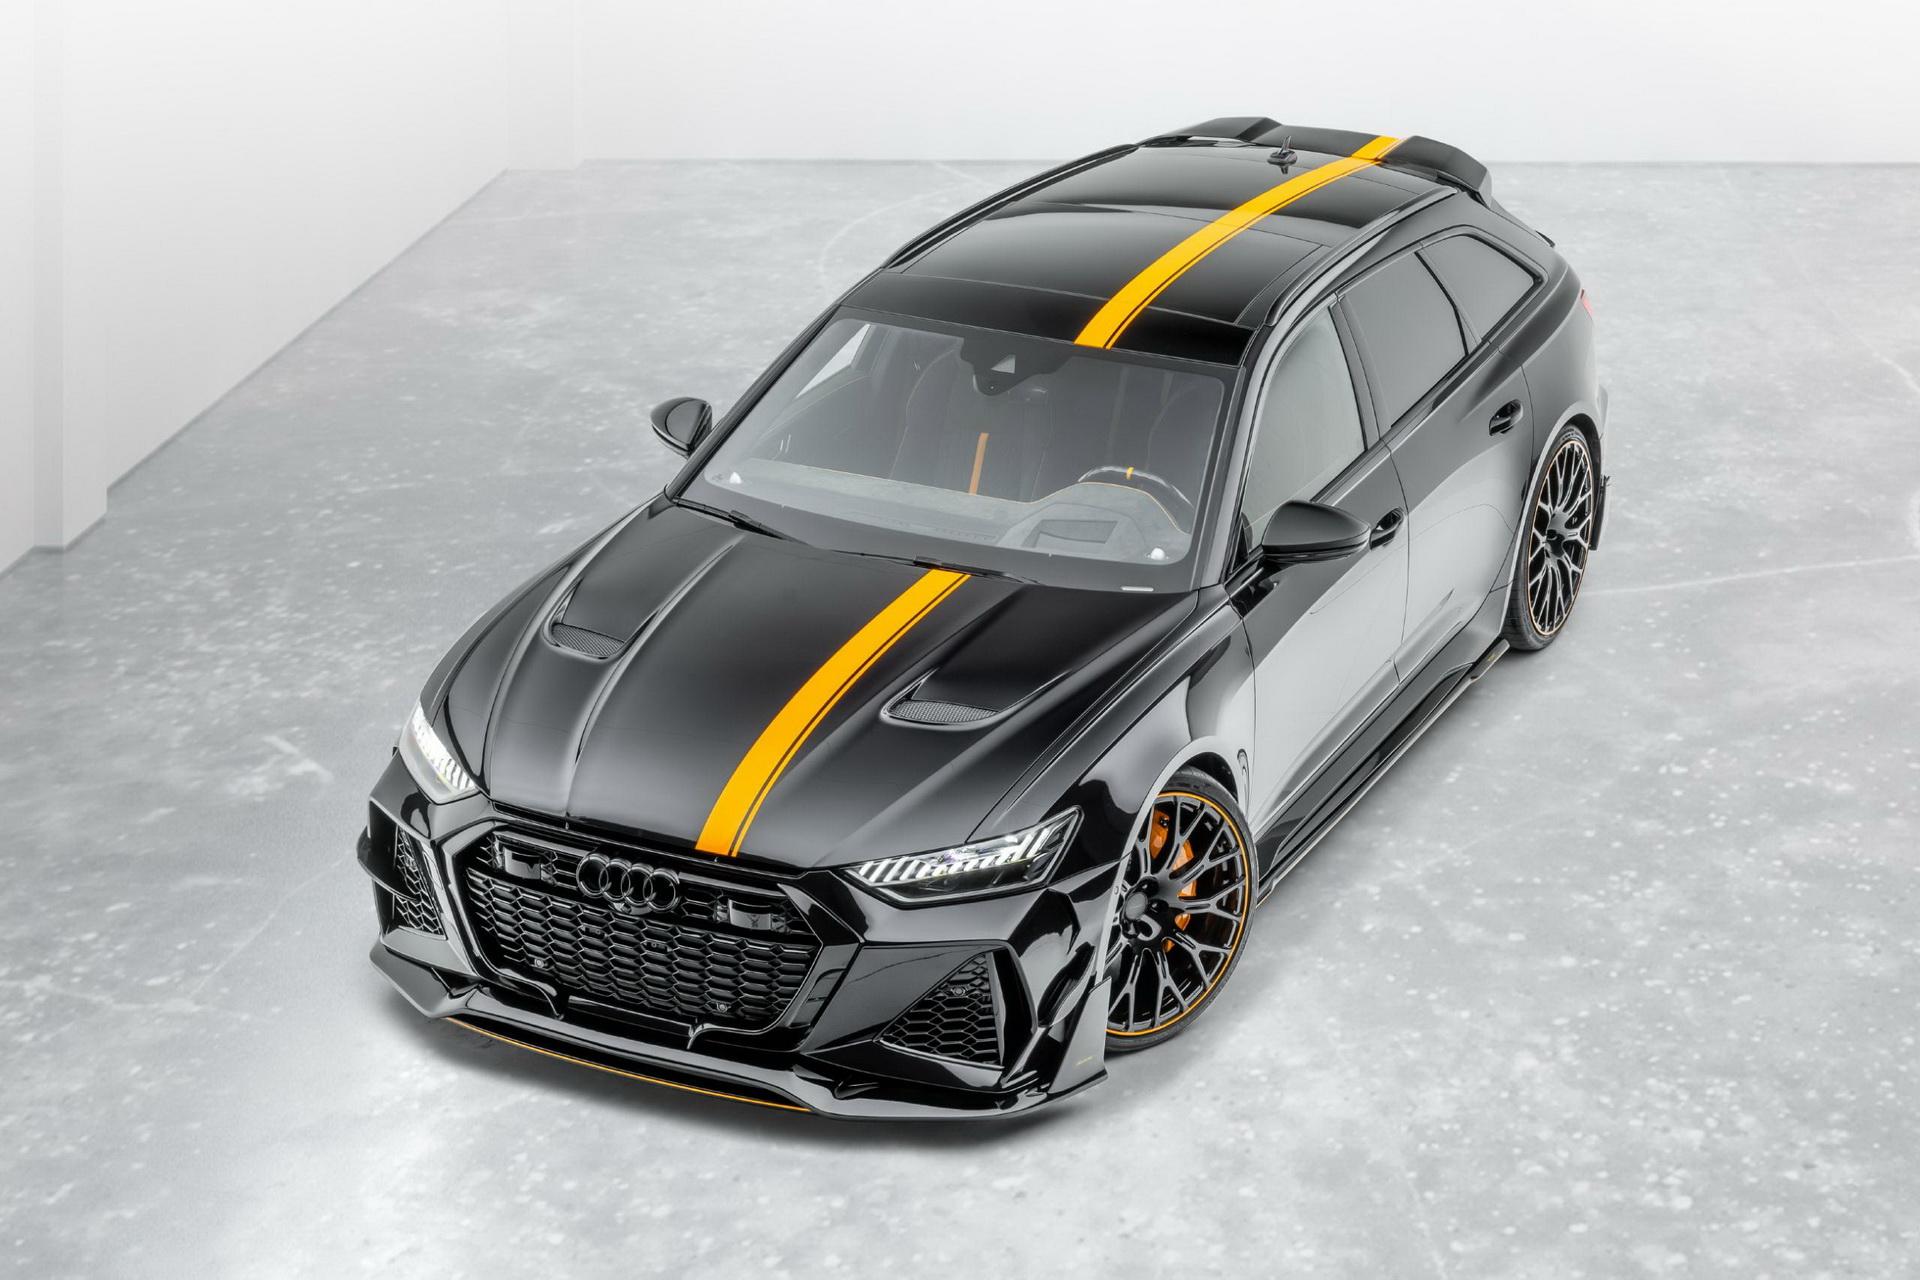 Audi_RS6_Avant_By_Mansory_0005